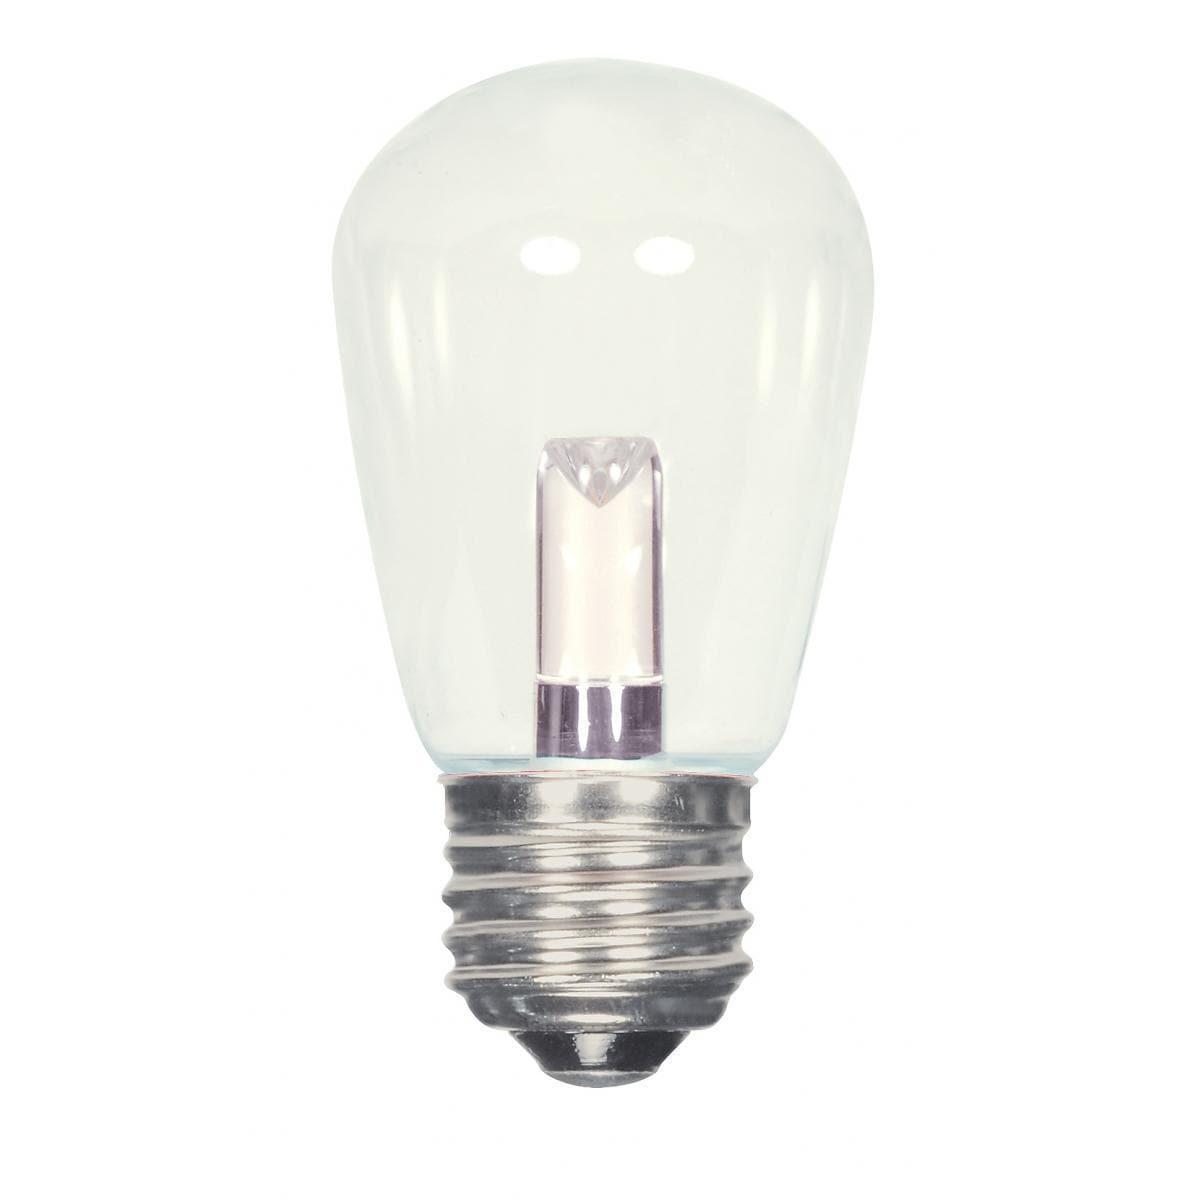 SATCO 1.4W LED S14 - Clear - Medium Base - 120V (Clear) (...